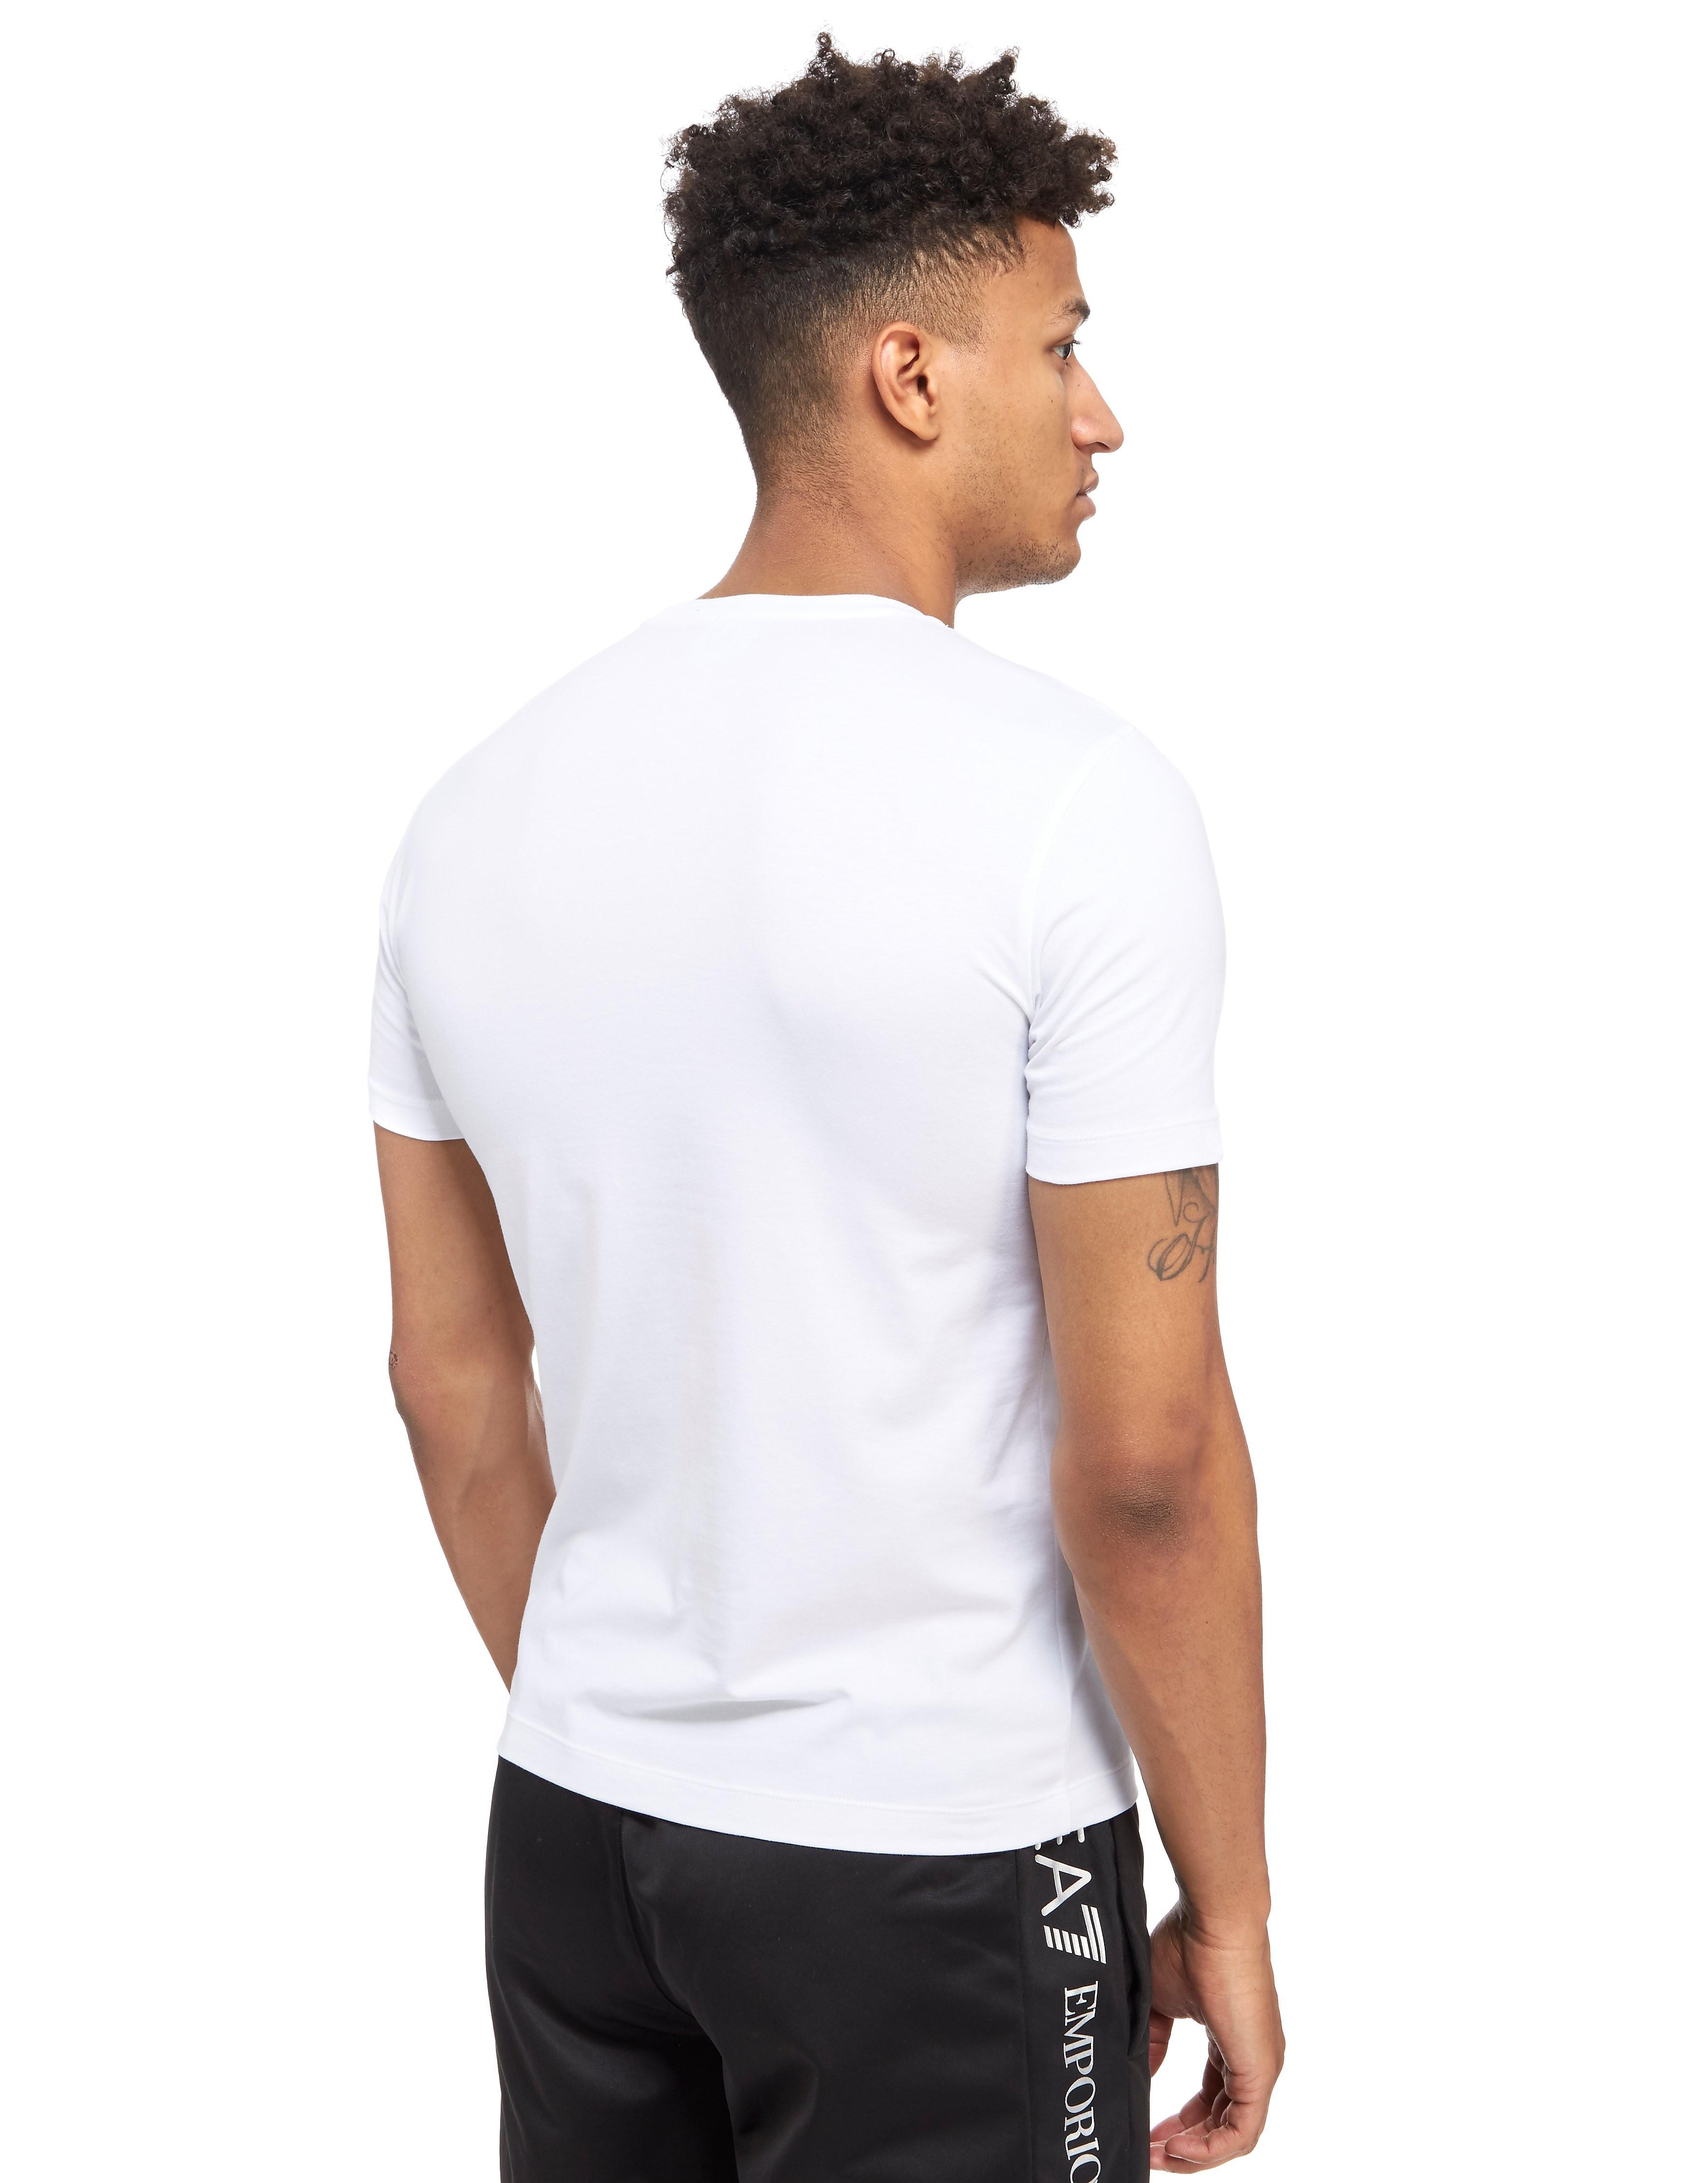 Emporio Armani EA7 Carbon Print T-Shirt